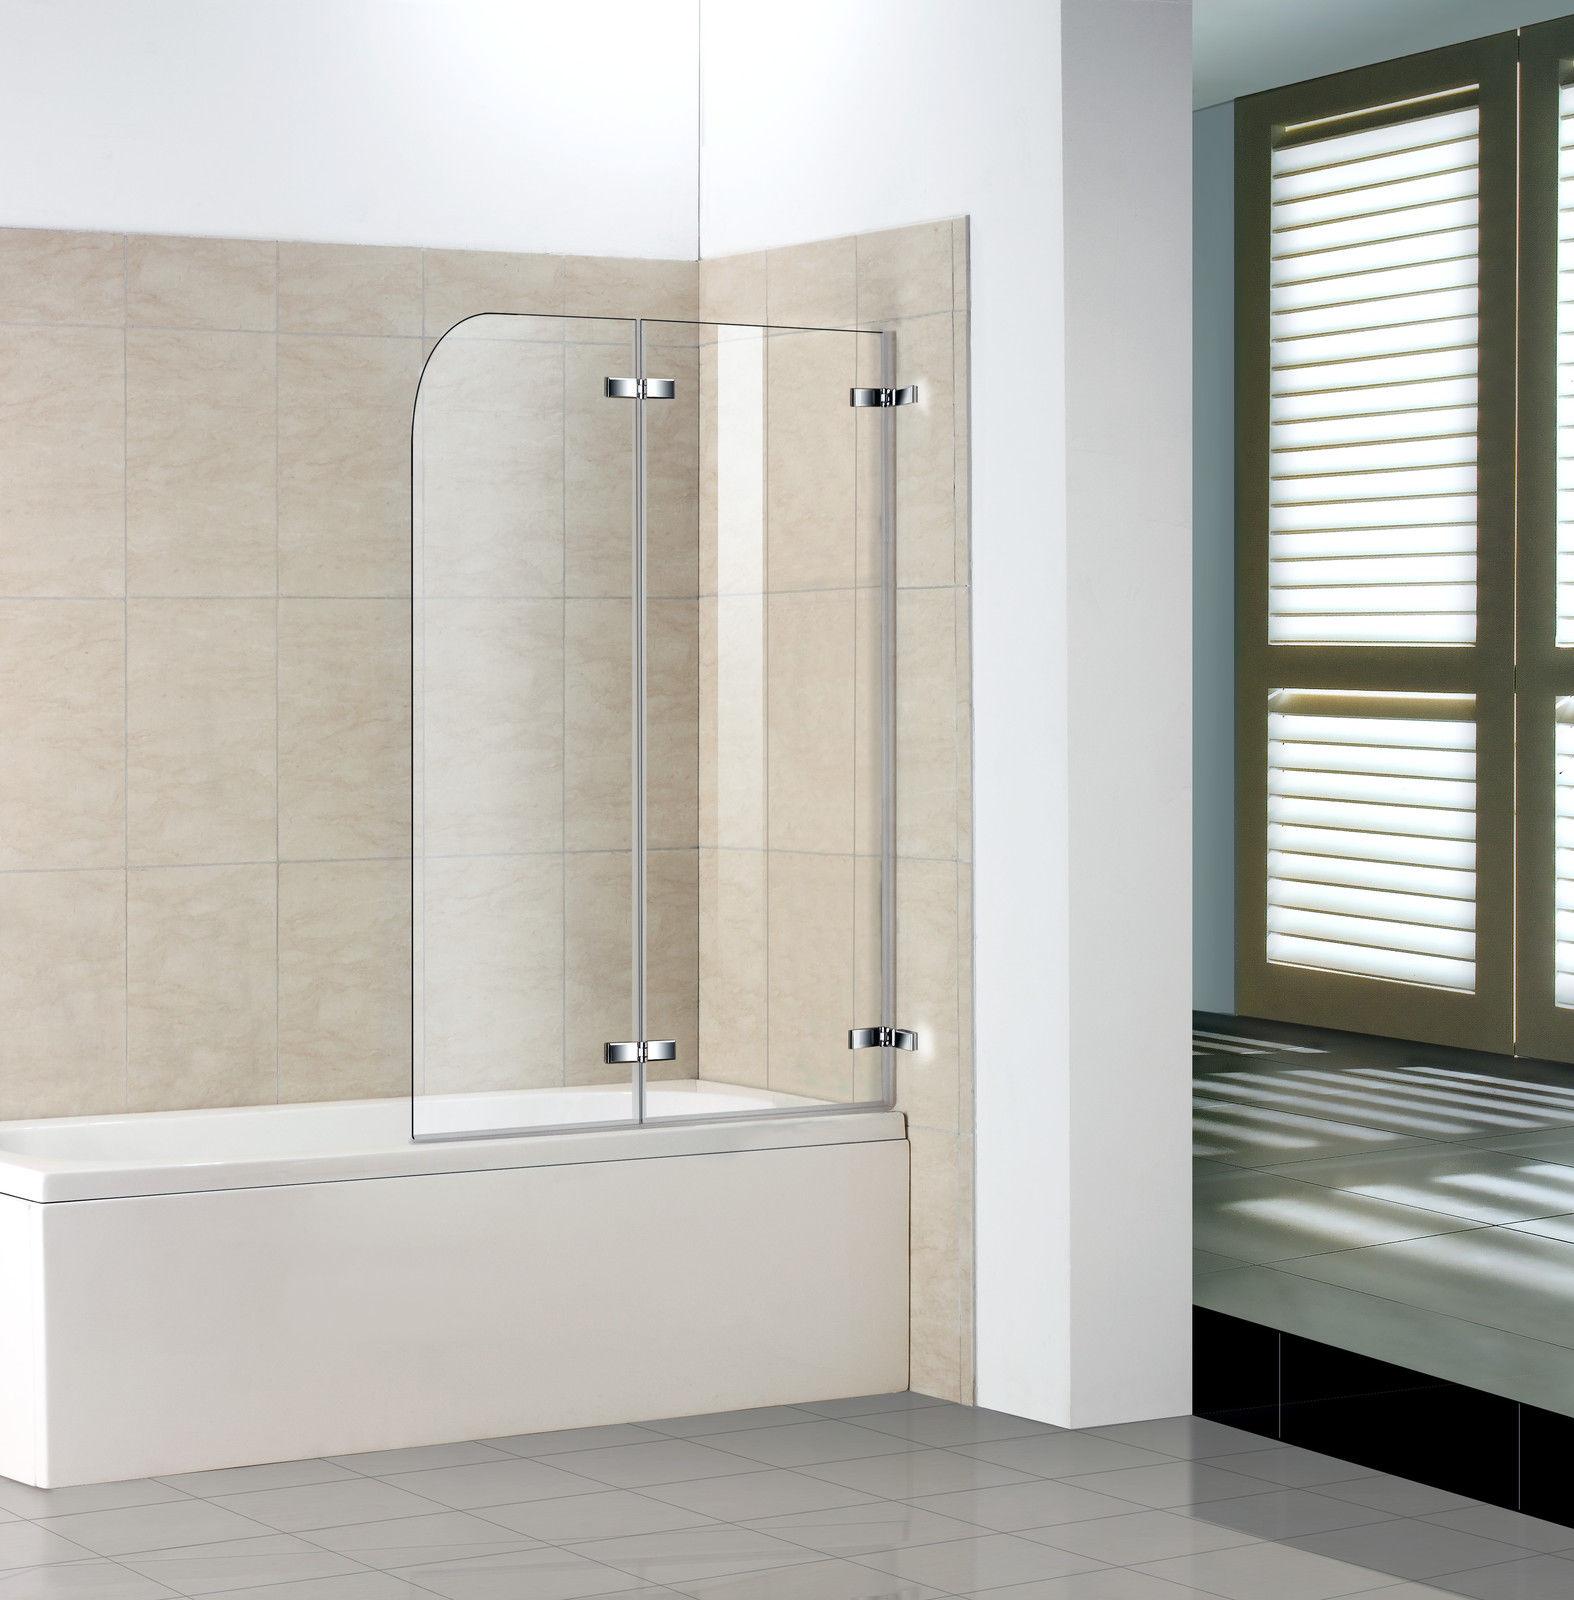 110x140cm Badewanne 2 Tlg Faltwand Duschwand Duschabtrennung H2h 11 116 99 Aica Sanitar Gmbh Duschkabine Duschabtrennung